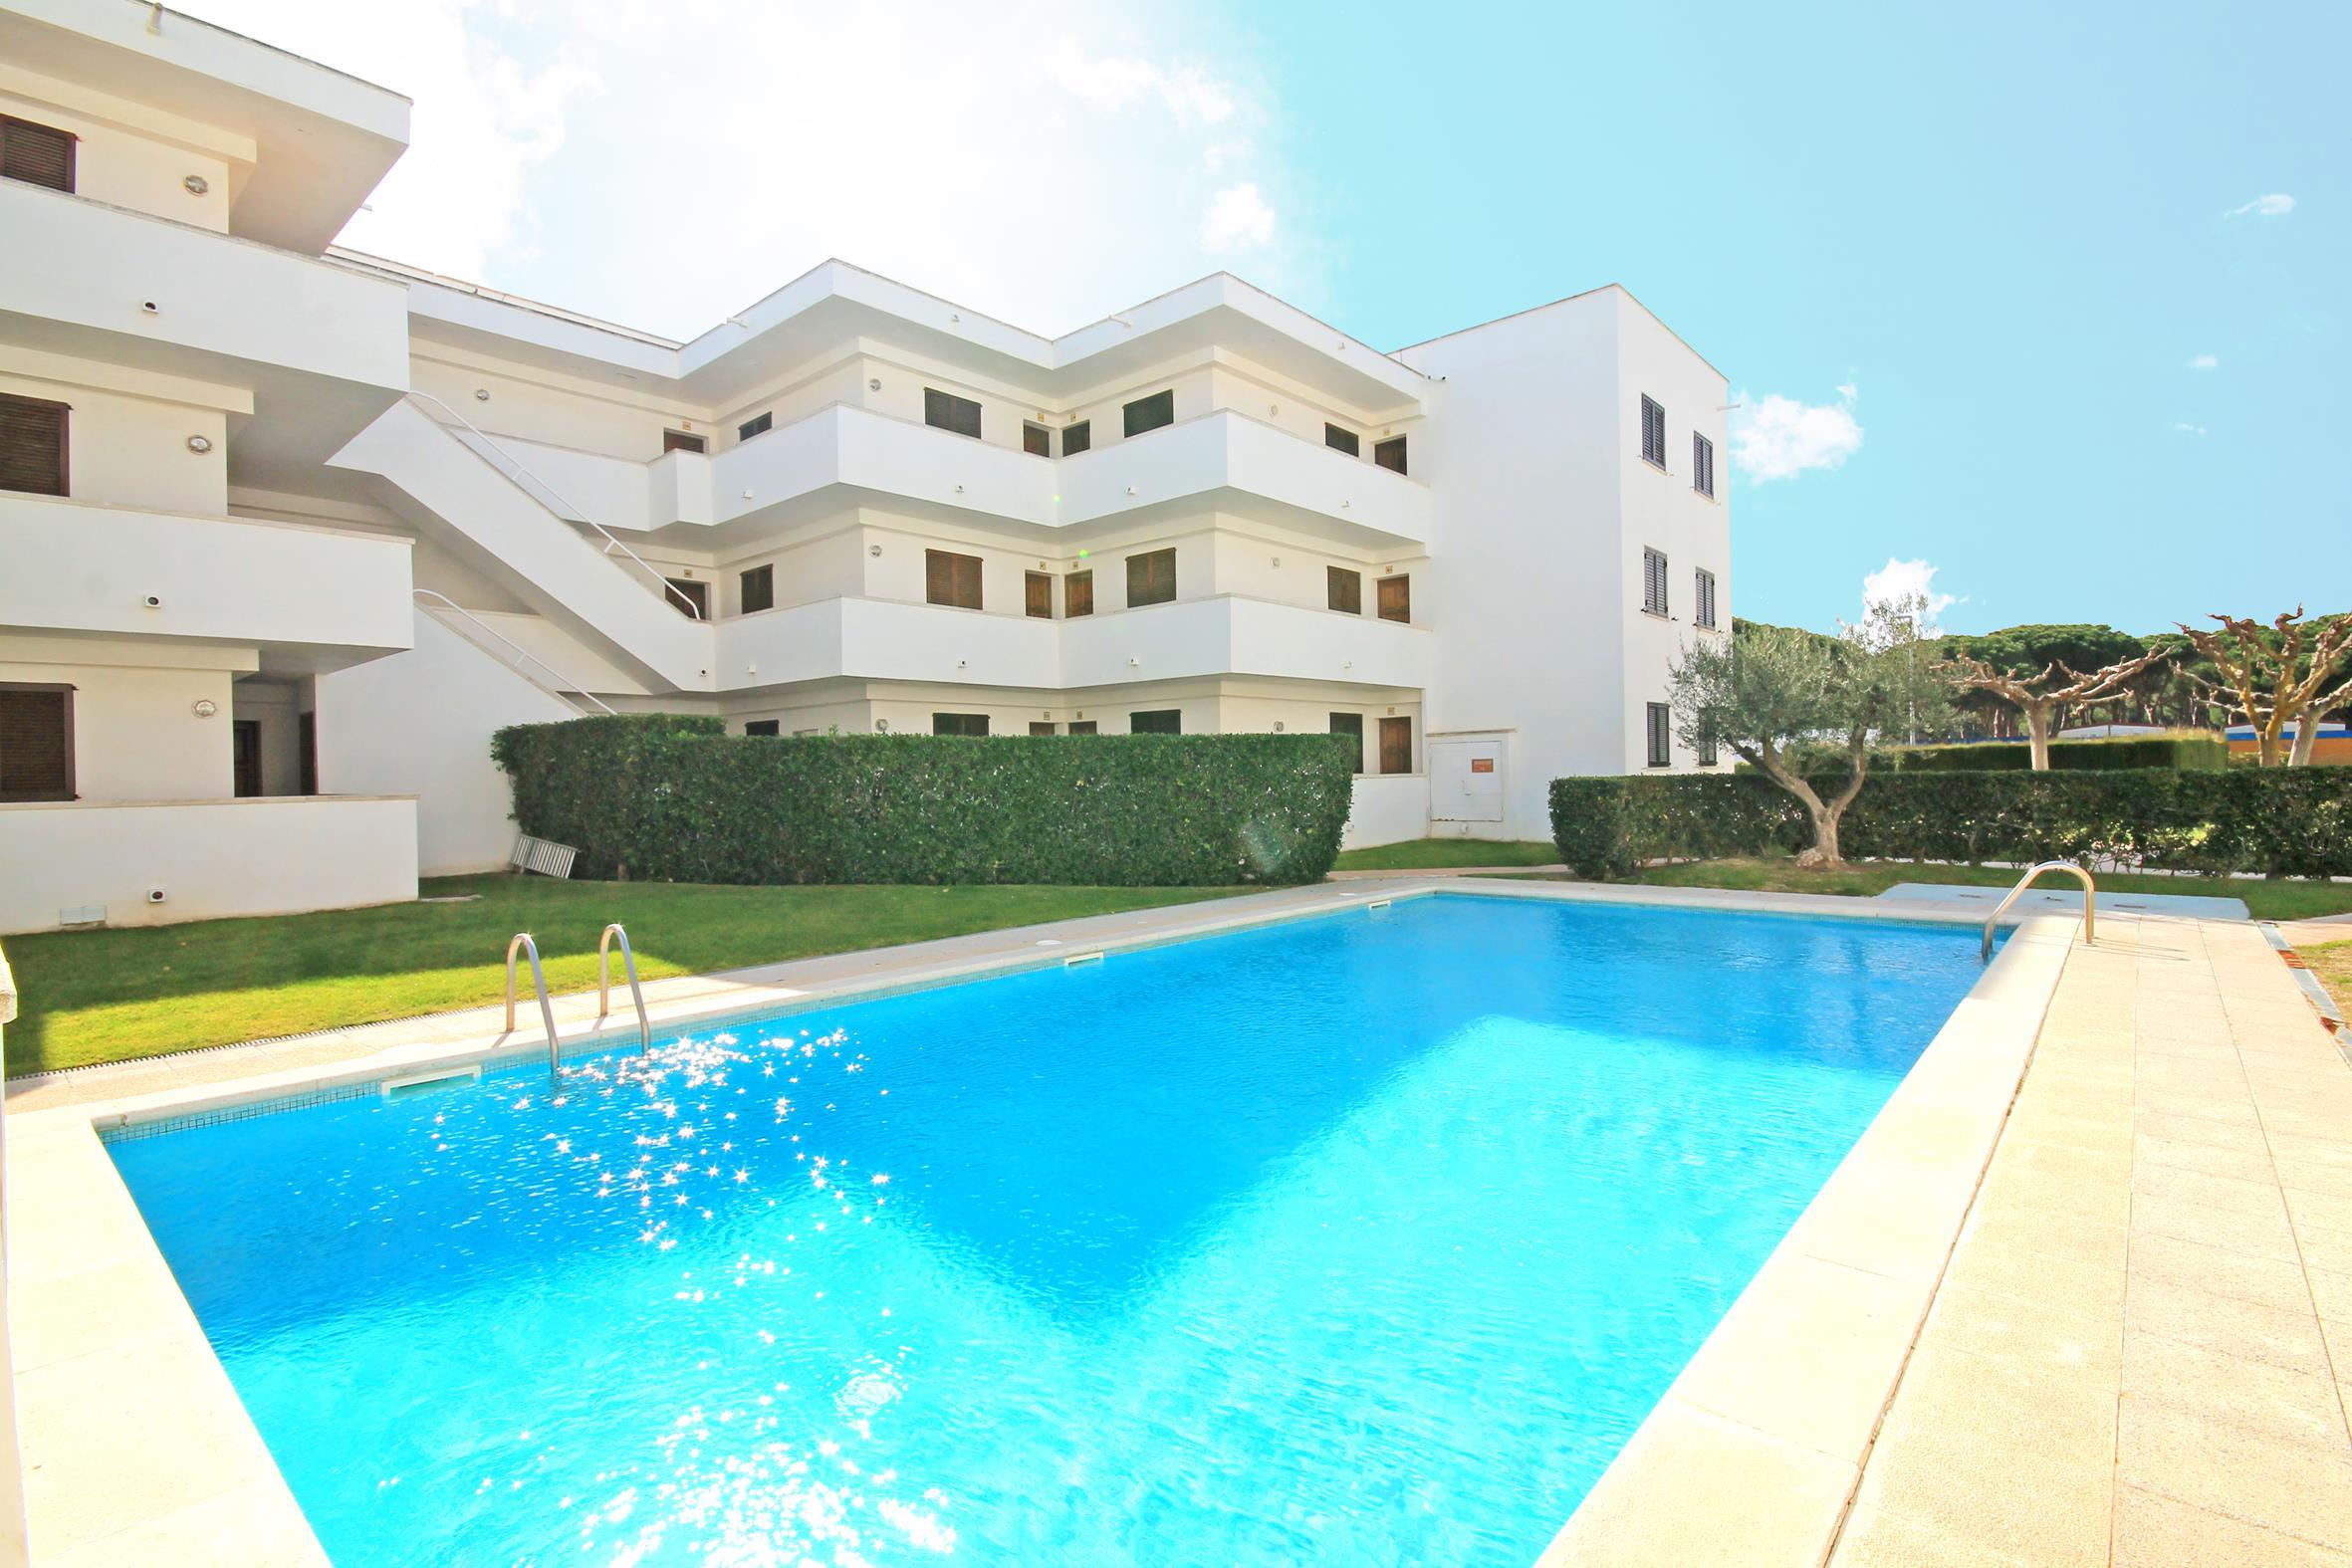 Villa Vert,L'Escala,Costa Brava #1